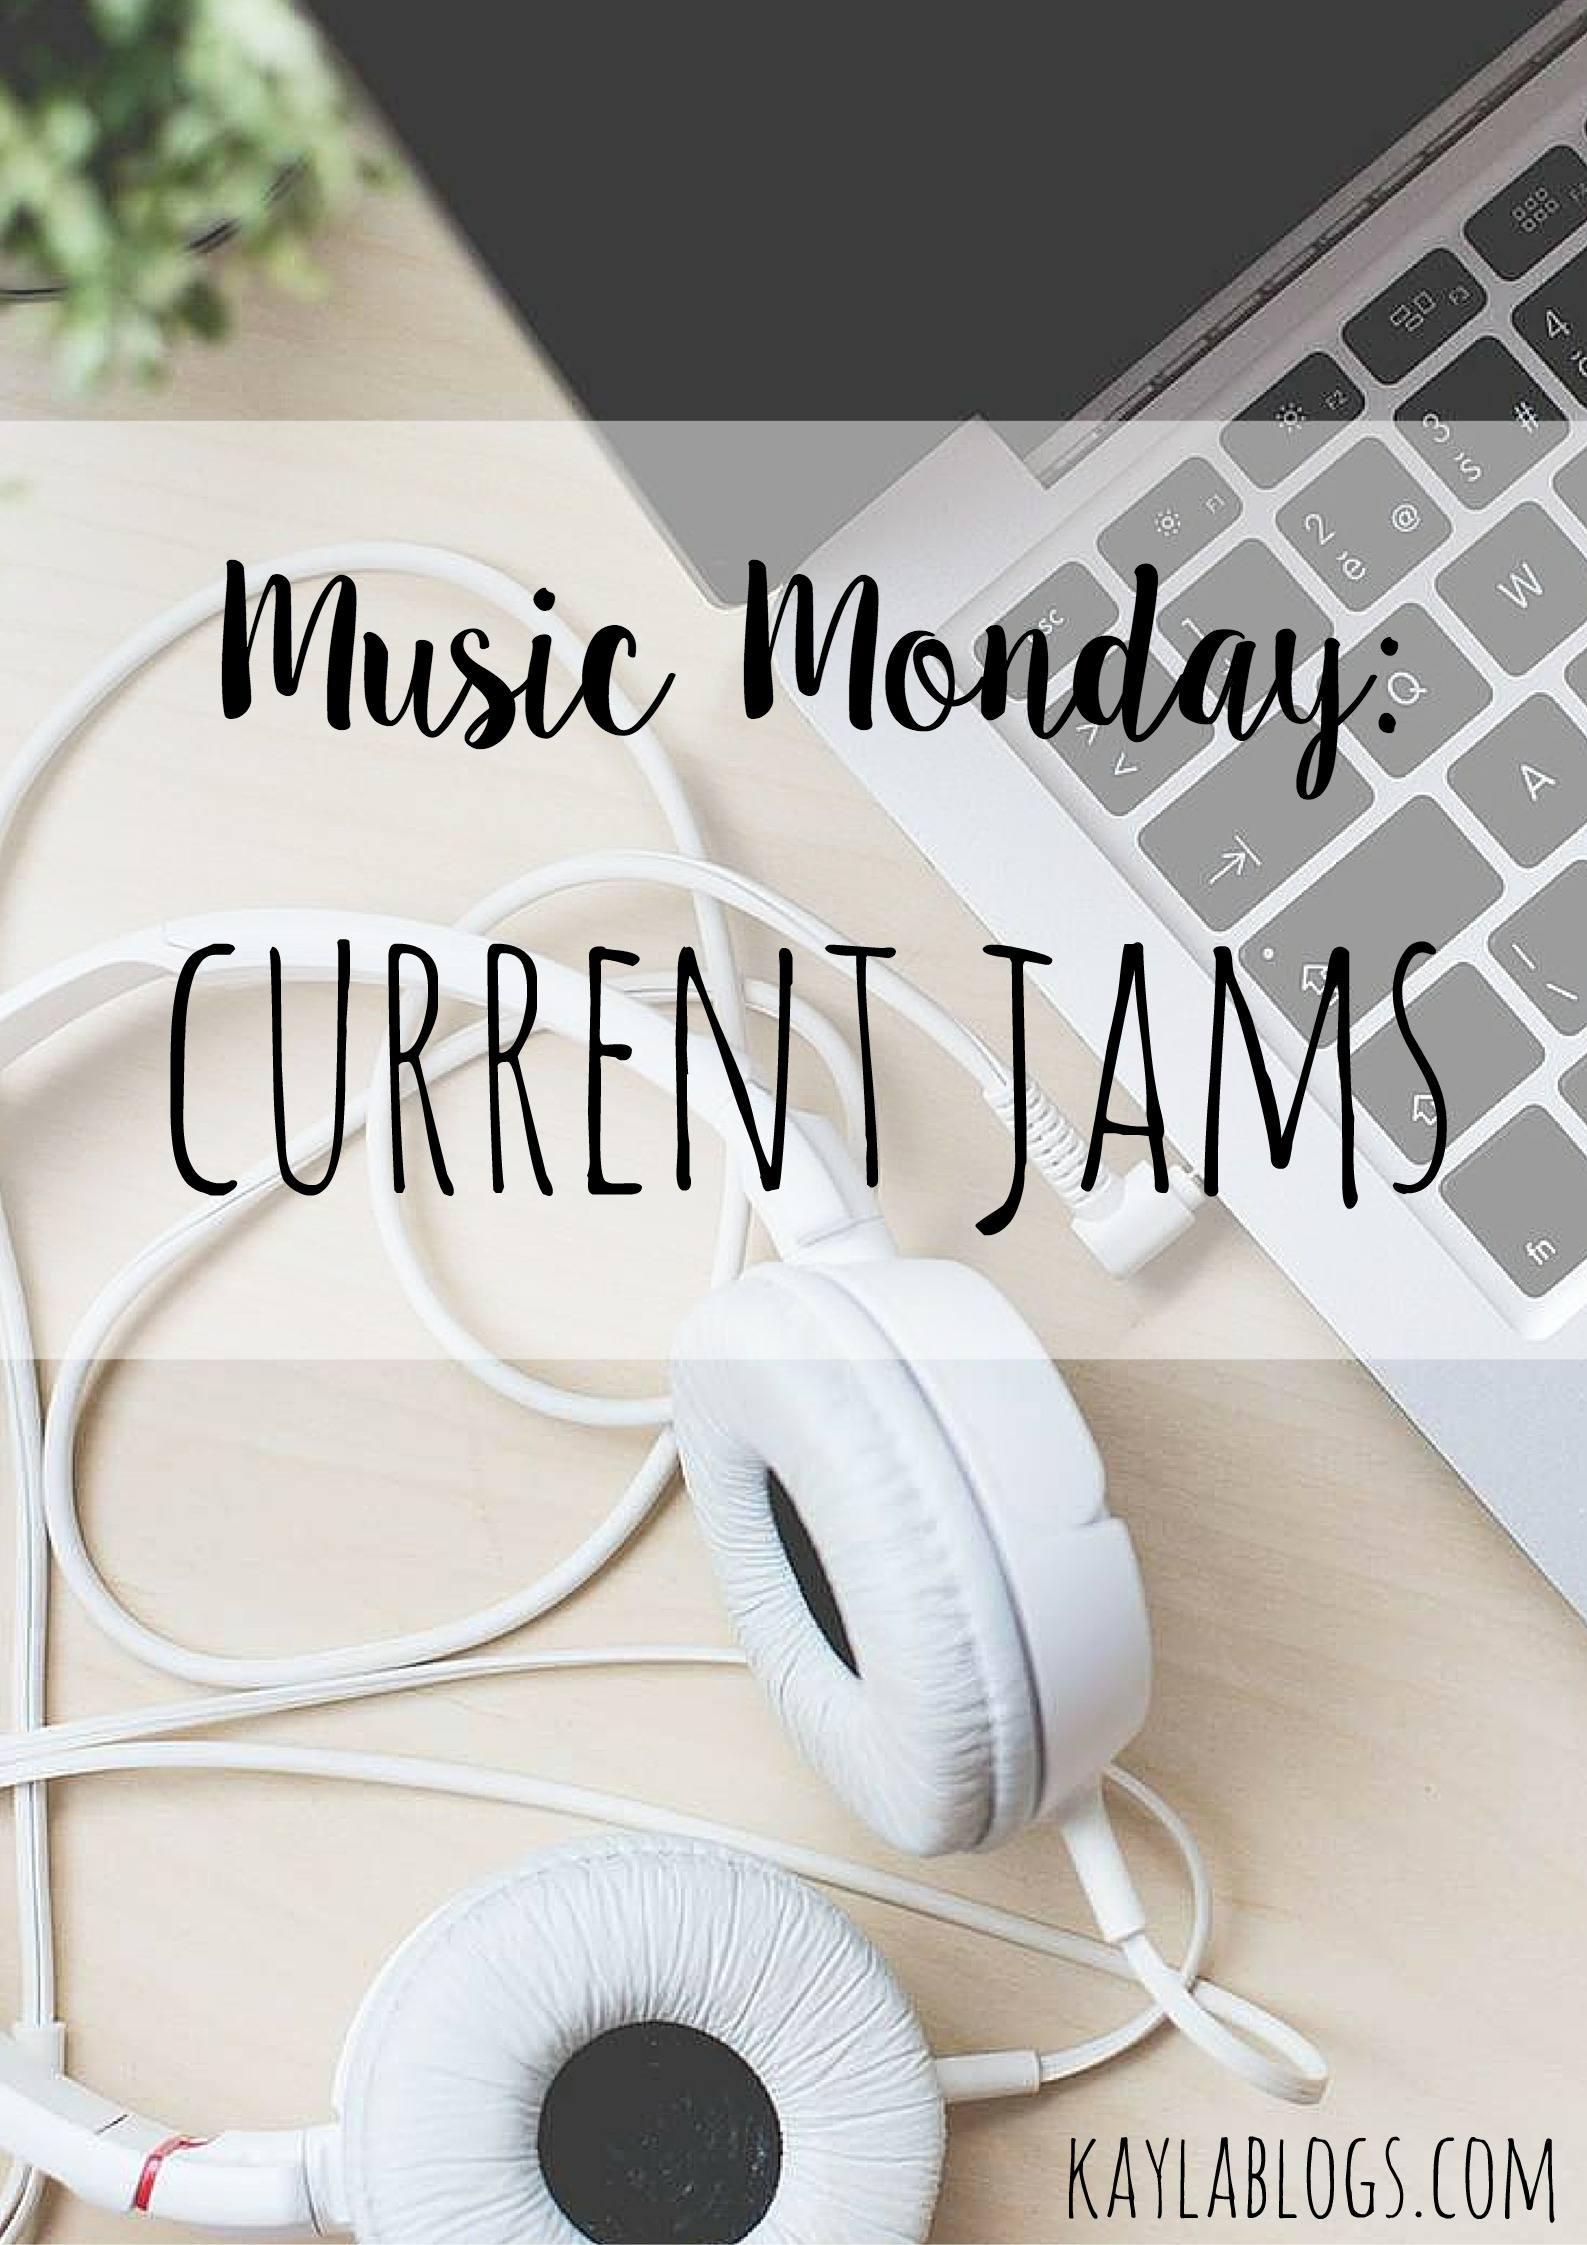 Music Monday: Current Jams